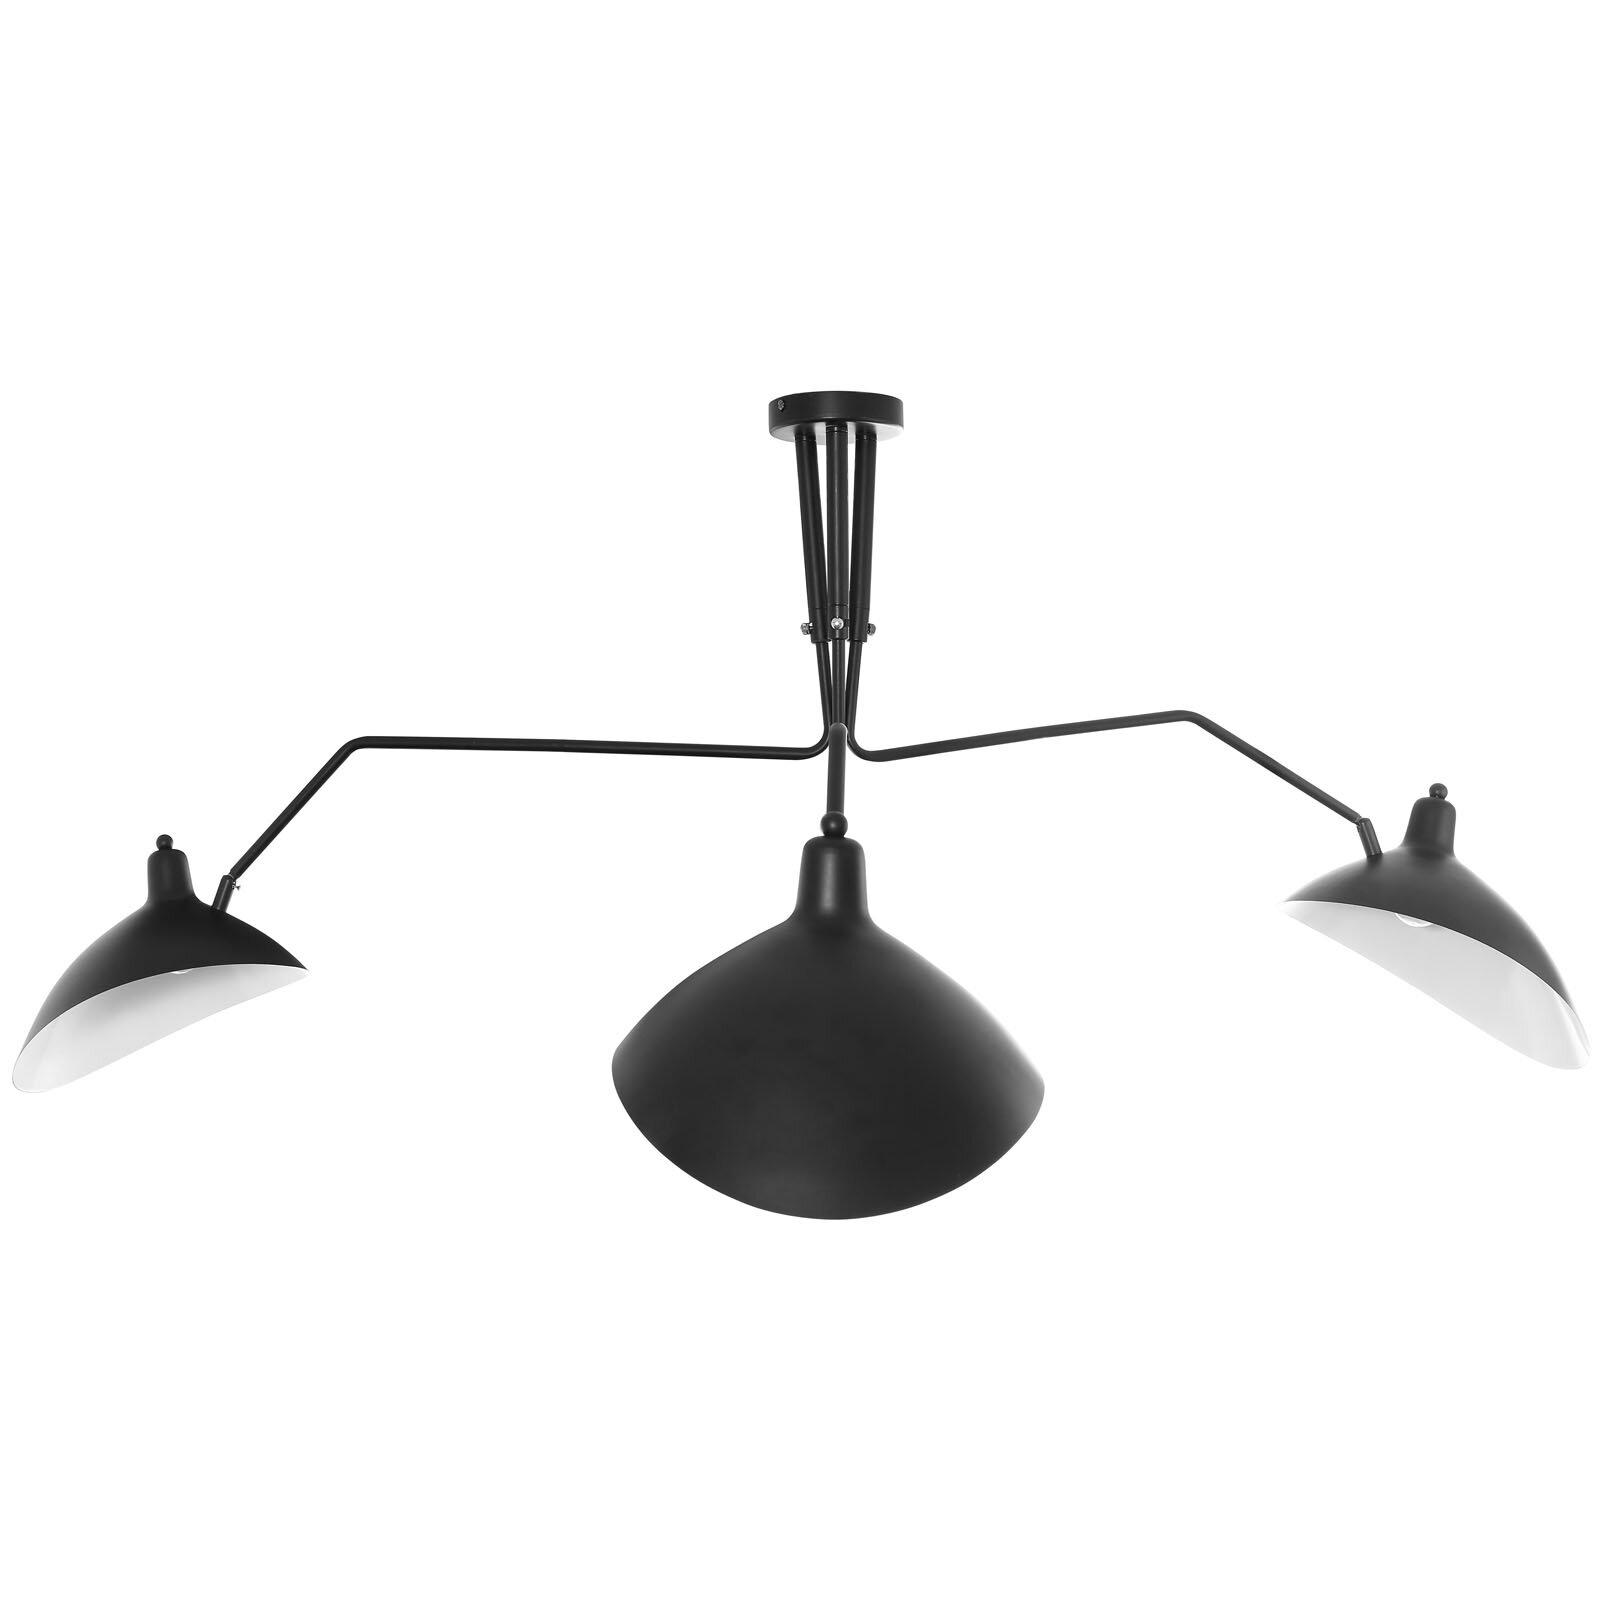 Elkland ceiling fixture 3 light cluster pendant reviews allmodern